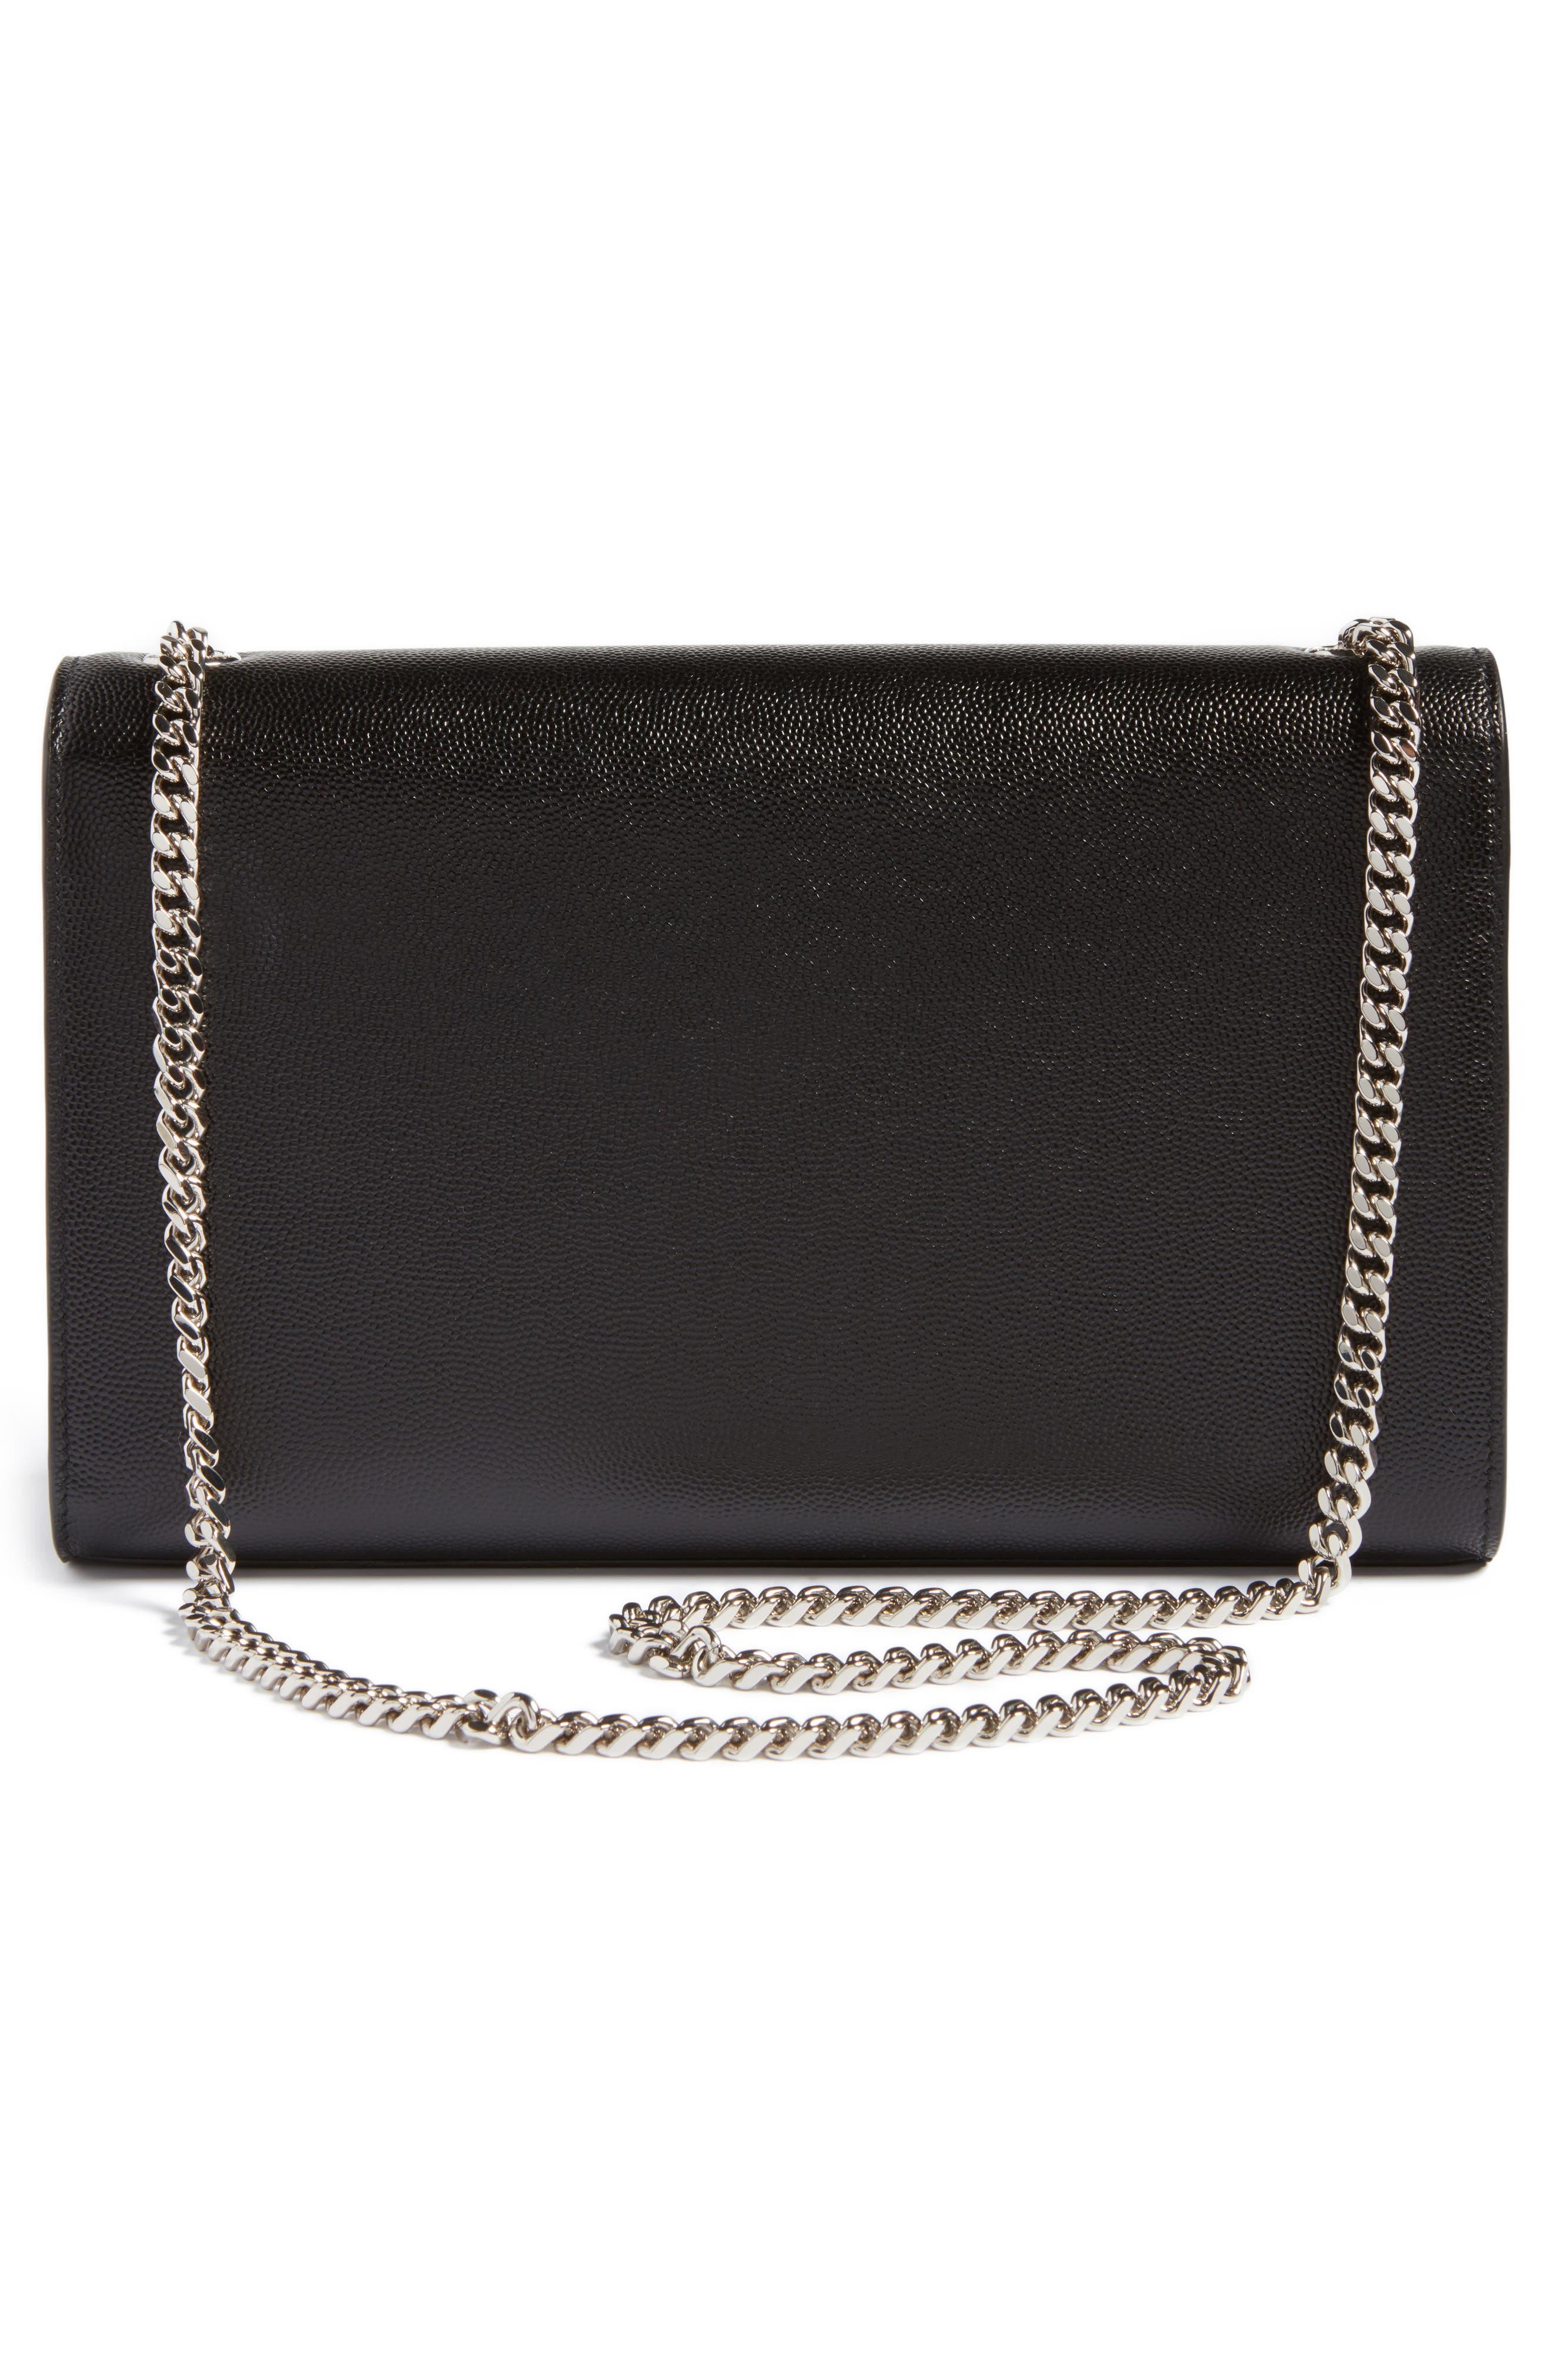 SAINT LAURENT, Medium Kate Calfskin Leather Shoulder Bag, Alternate thumbnail 3, color, NERO